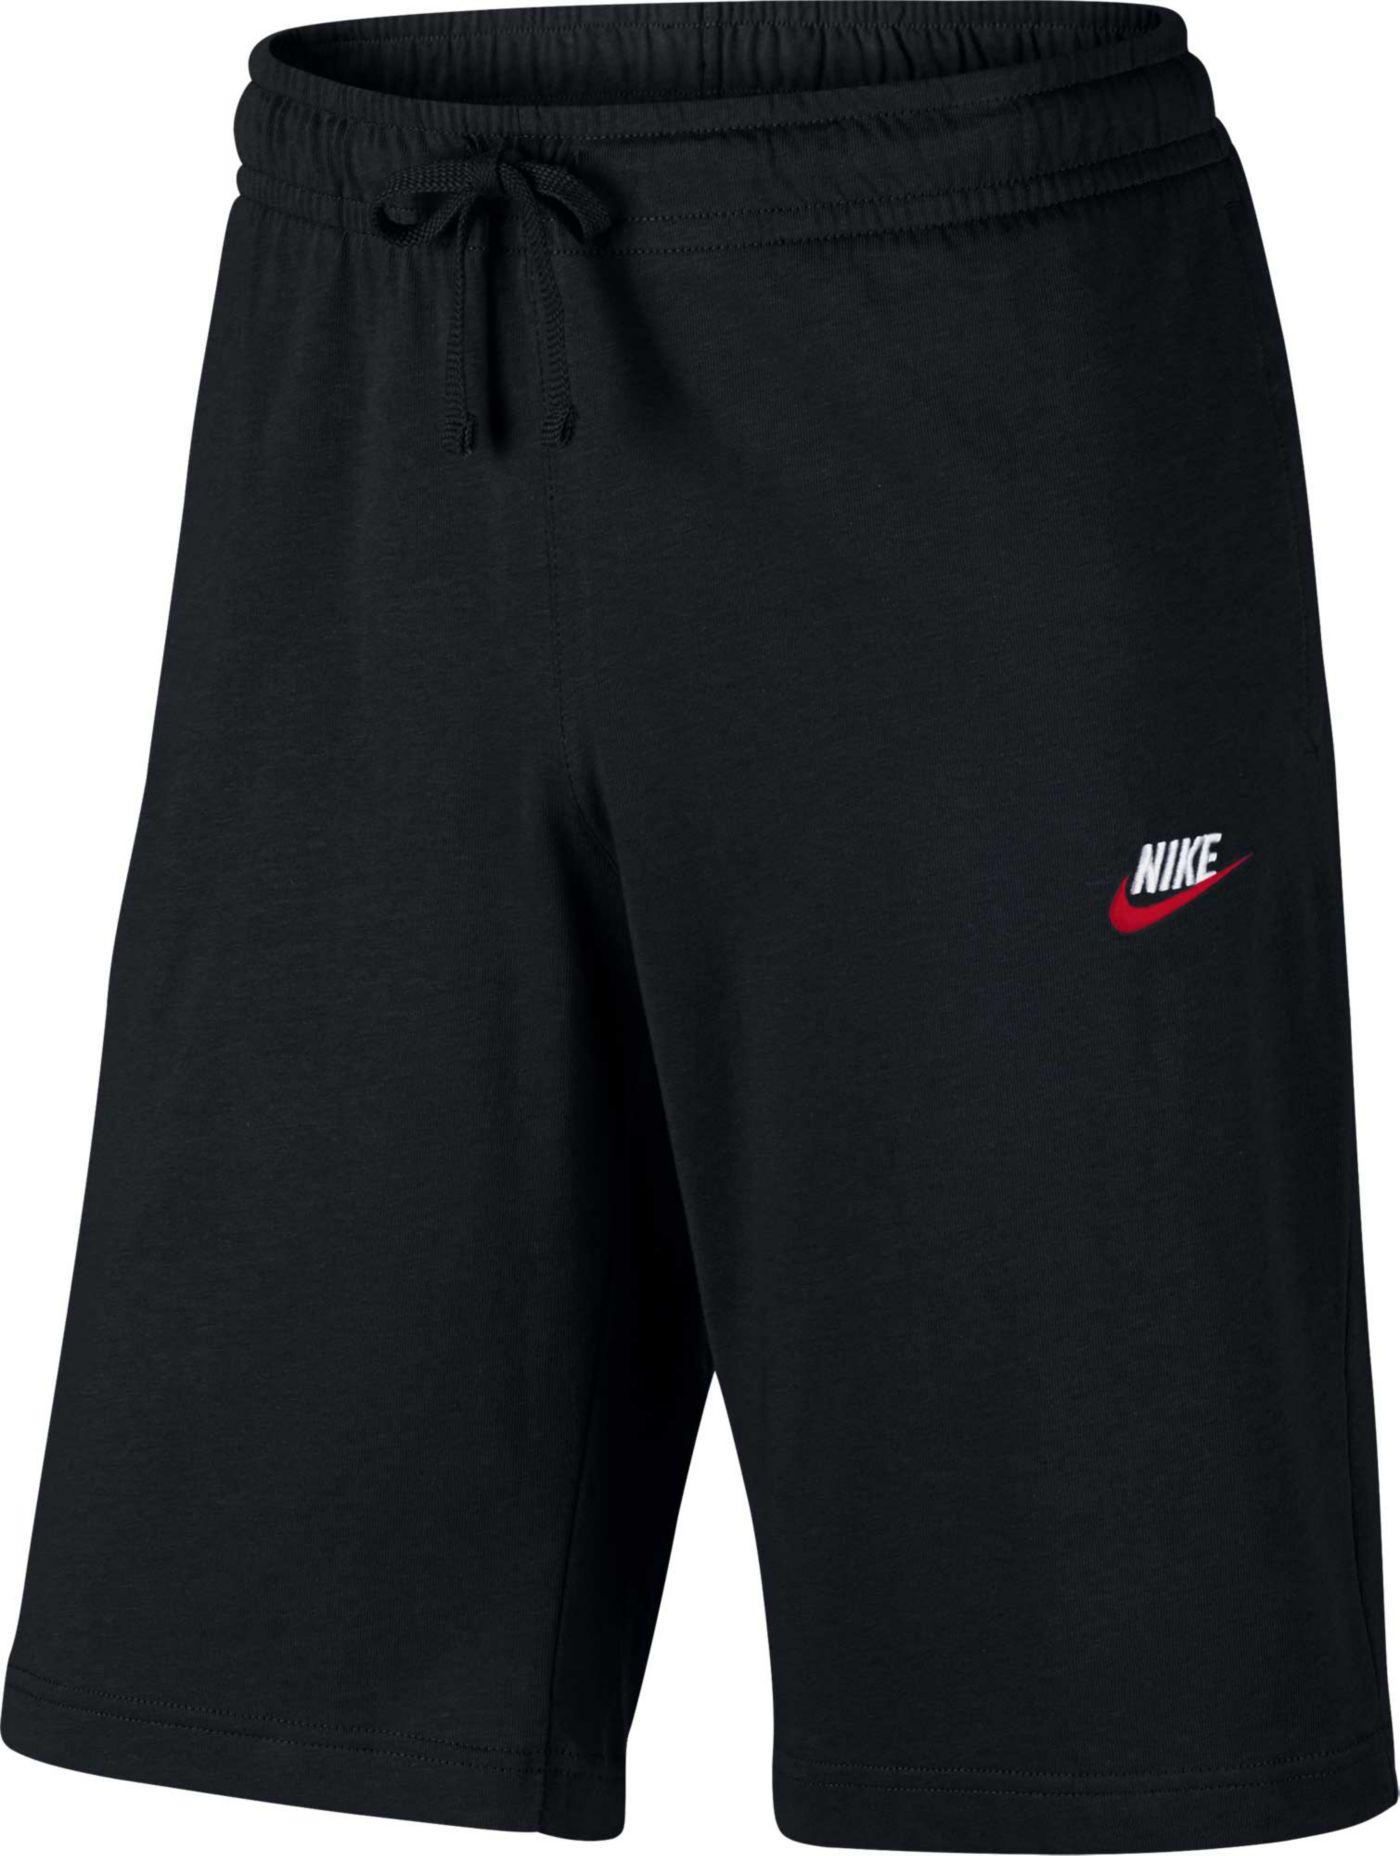 Nike Men's Sportswear Jersey Club Sweatshorts (Regular and Big & Tall)